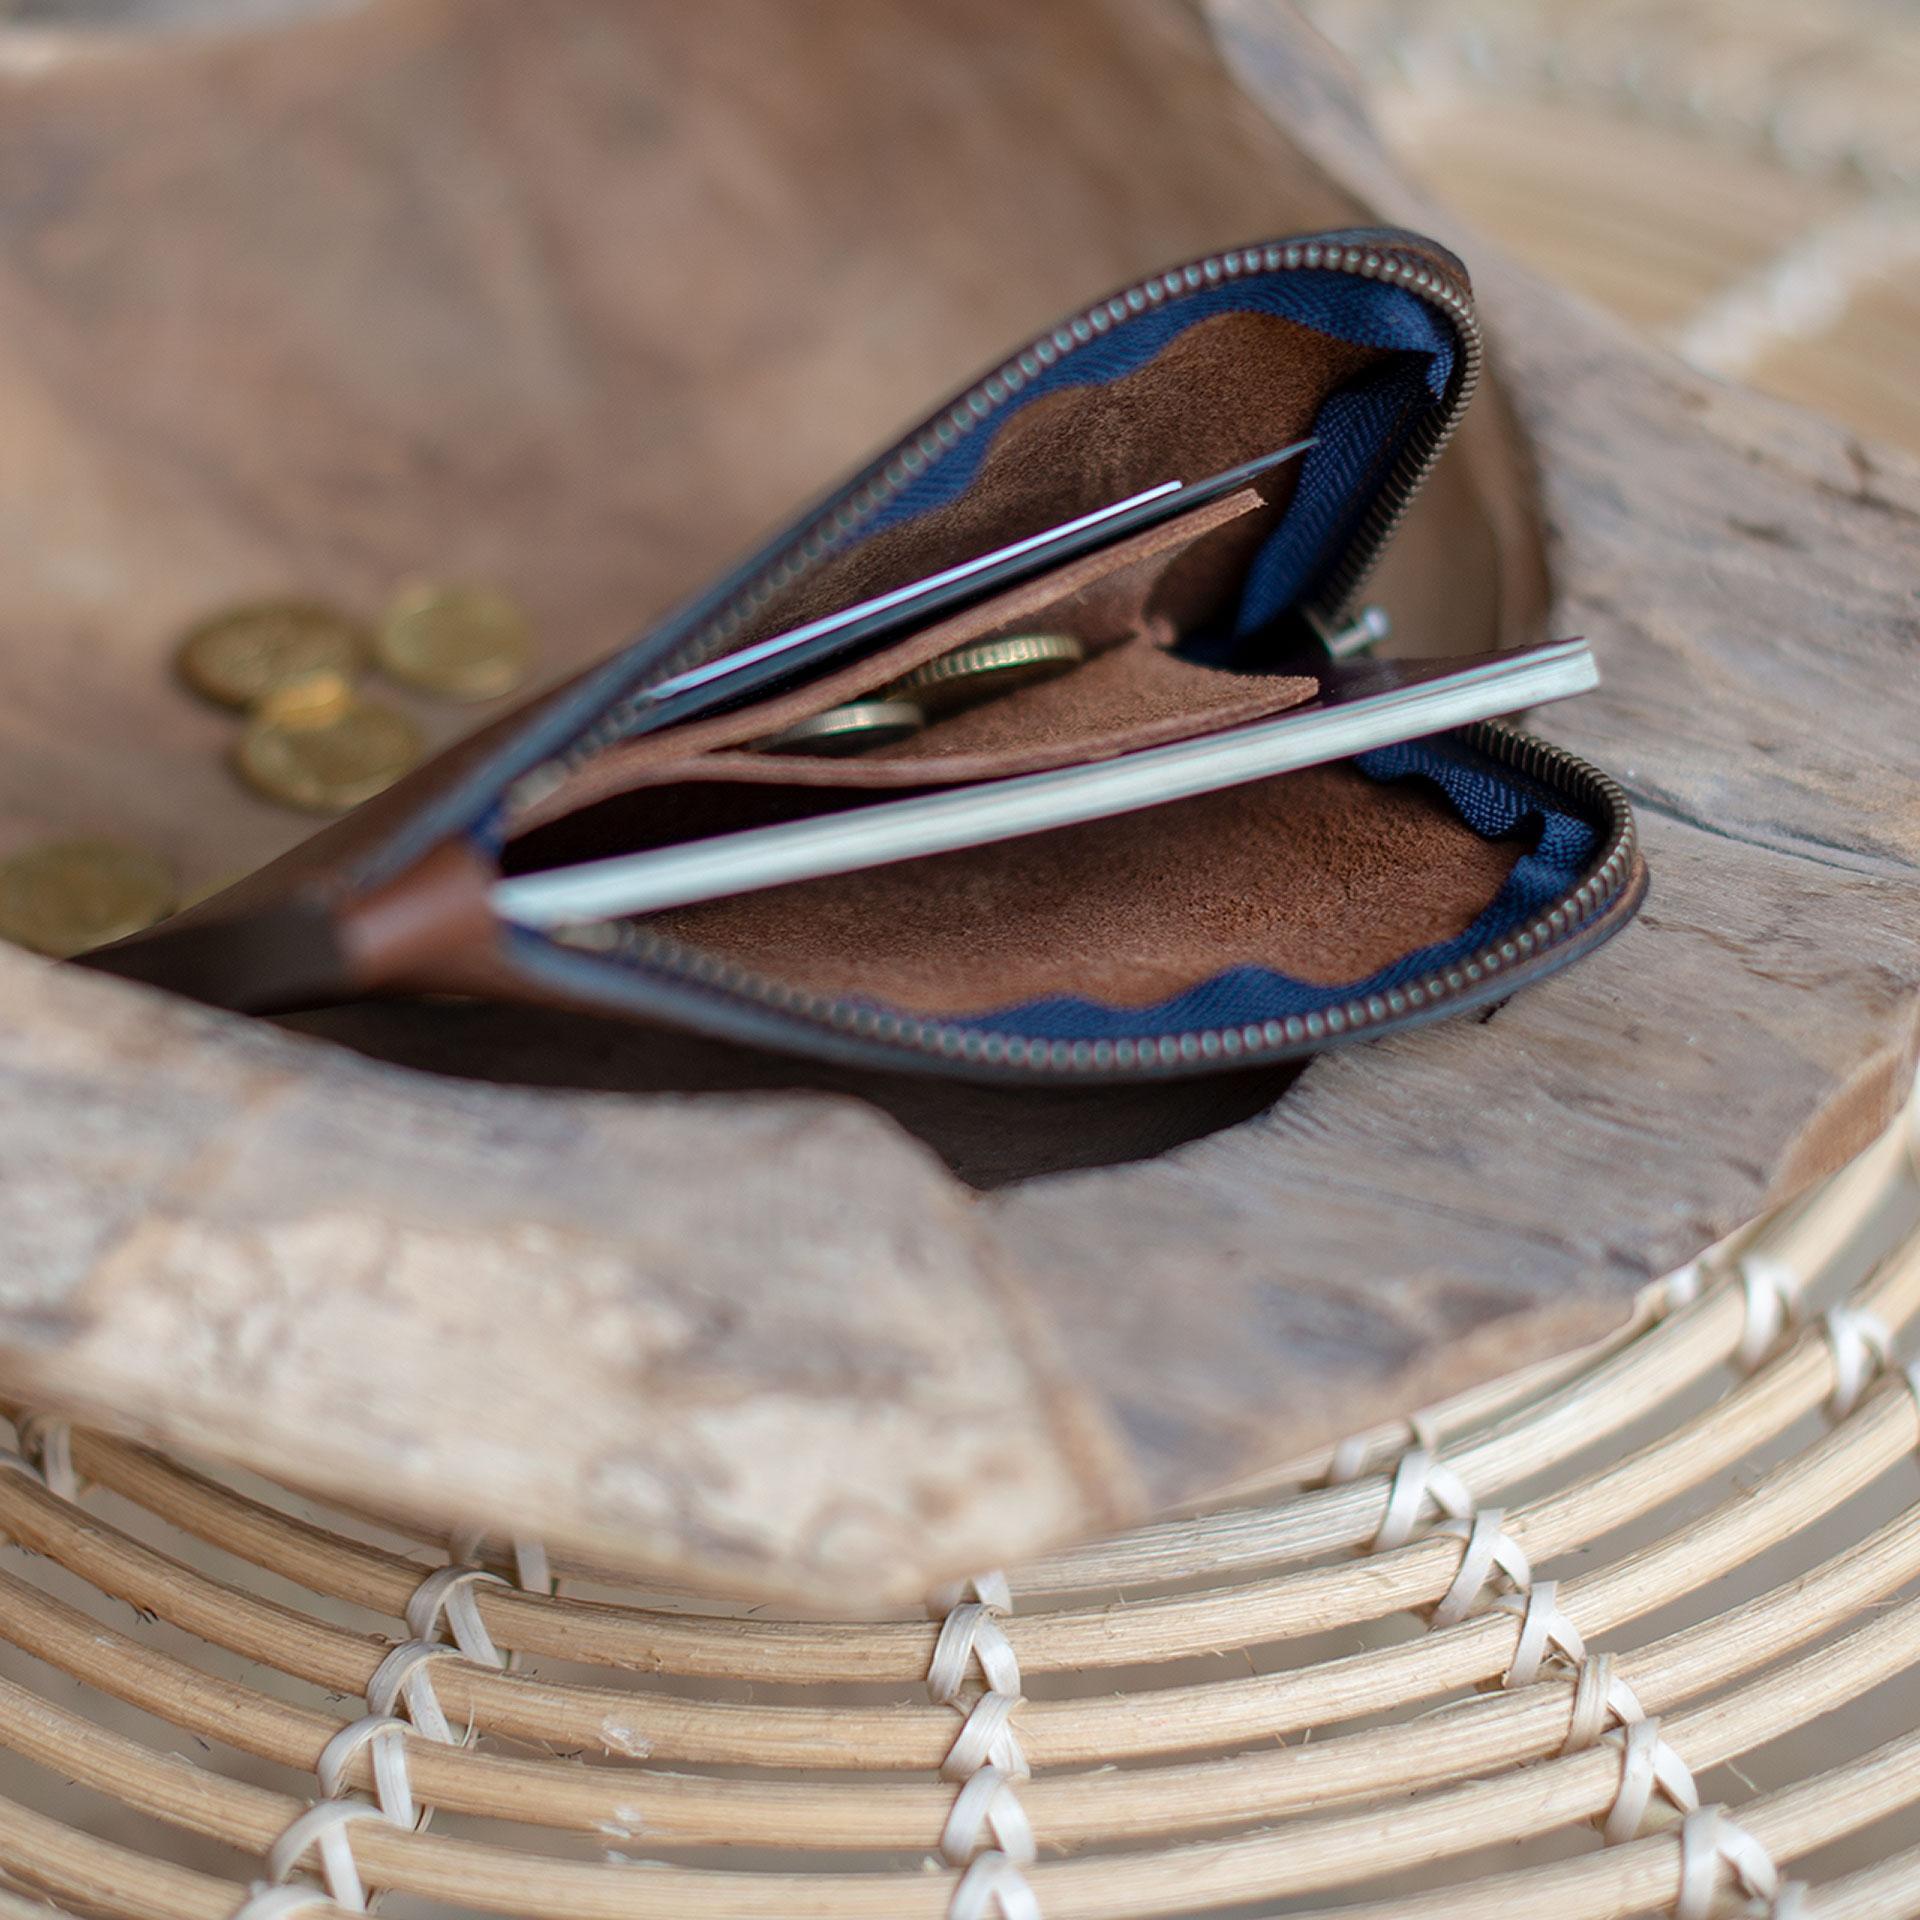 Daron zippered purse / XL - Peat (image n°5)